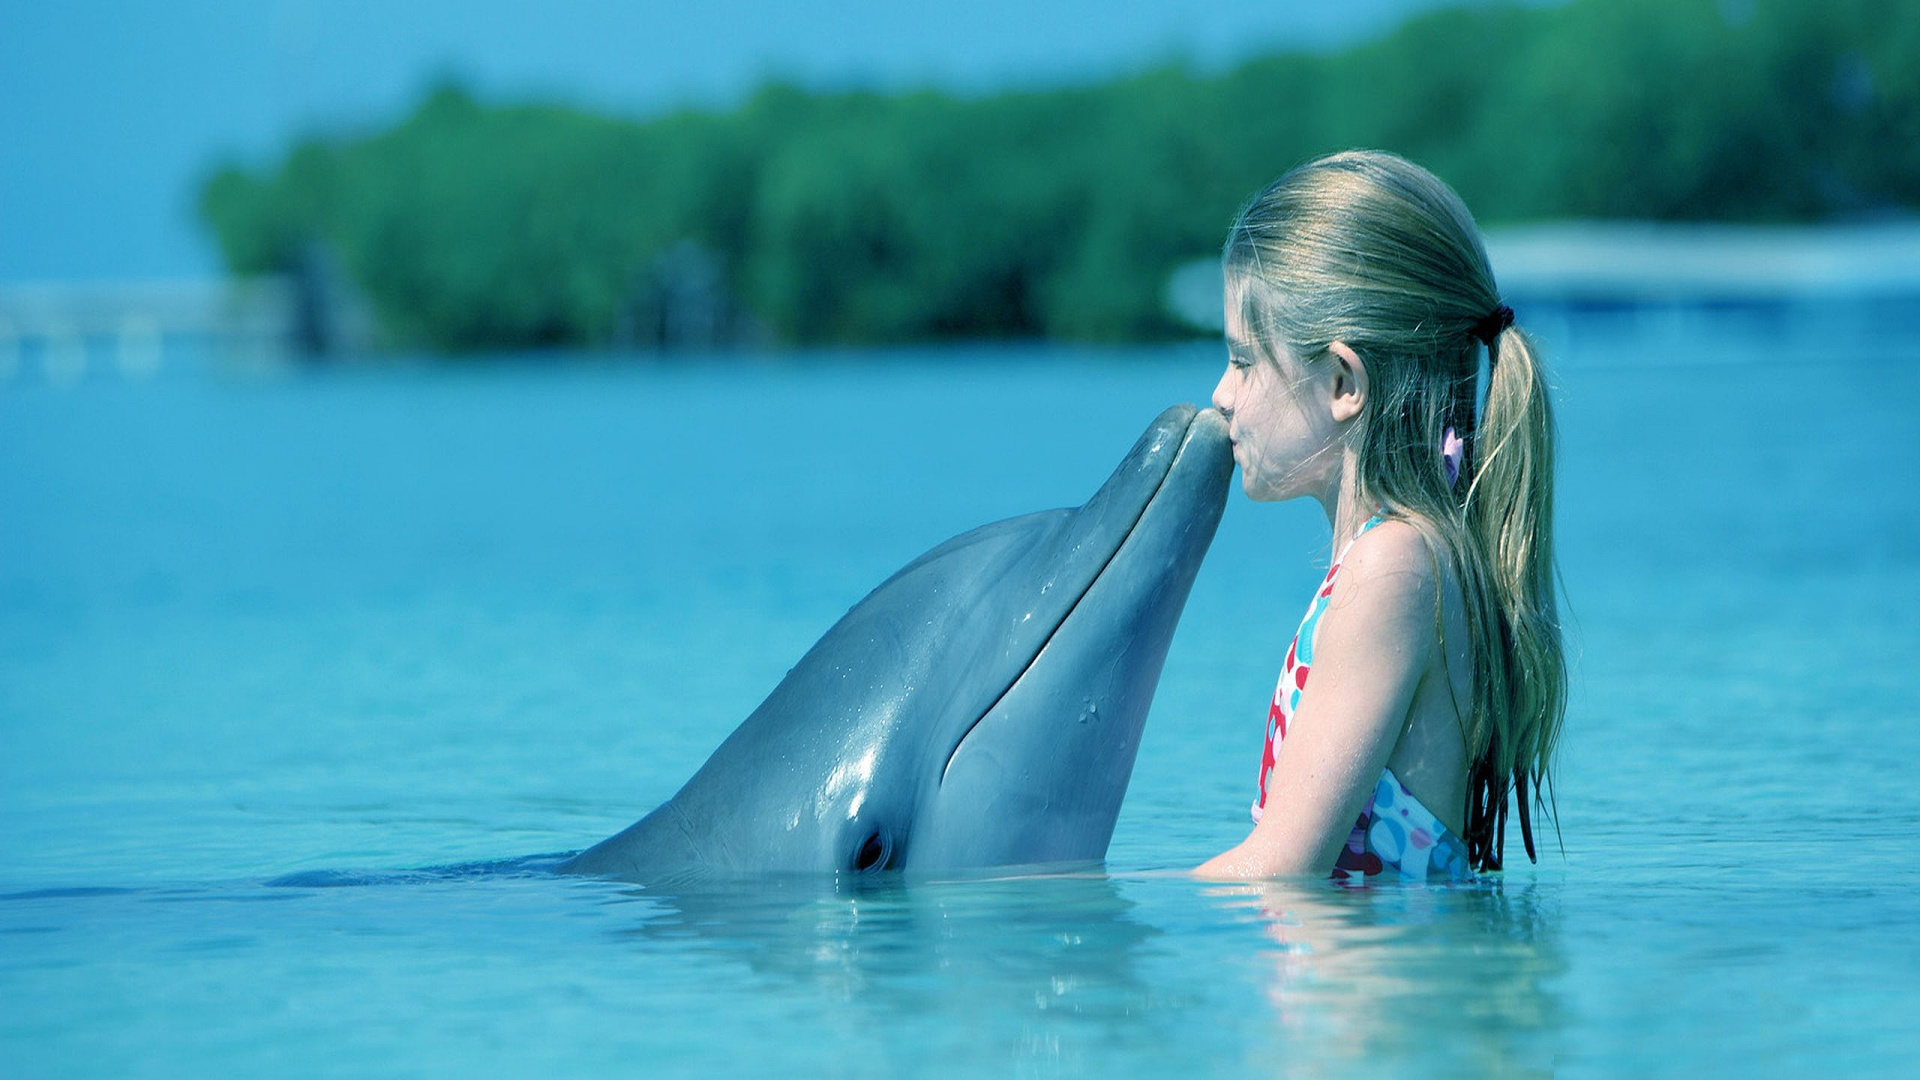 Happy Girl Wallpapers Free Dolphin Wallpapers Hd Pixelstalk Net